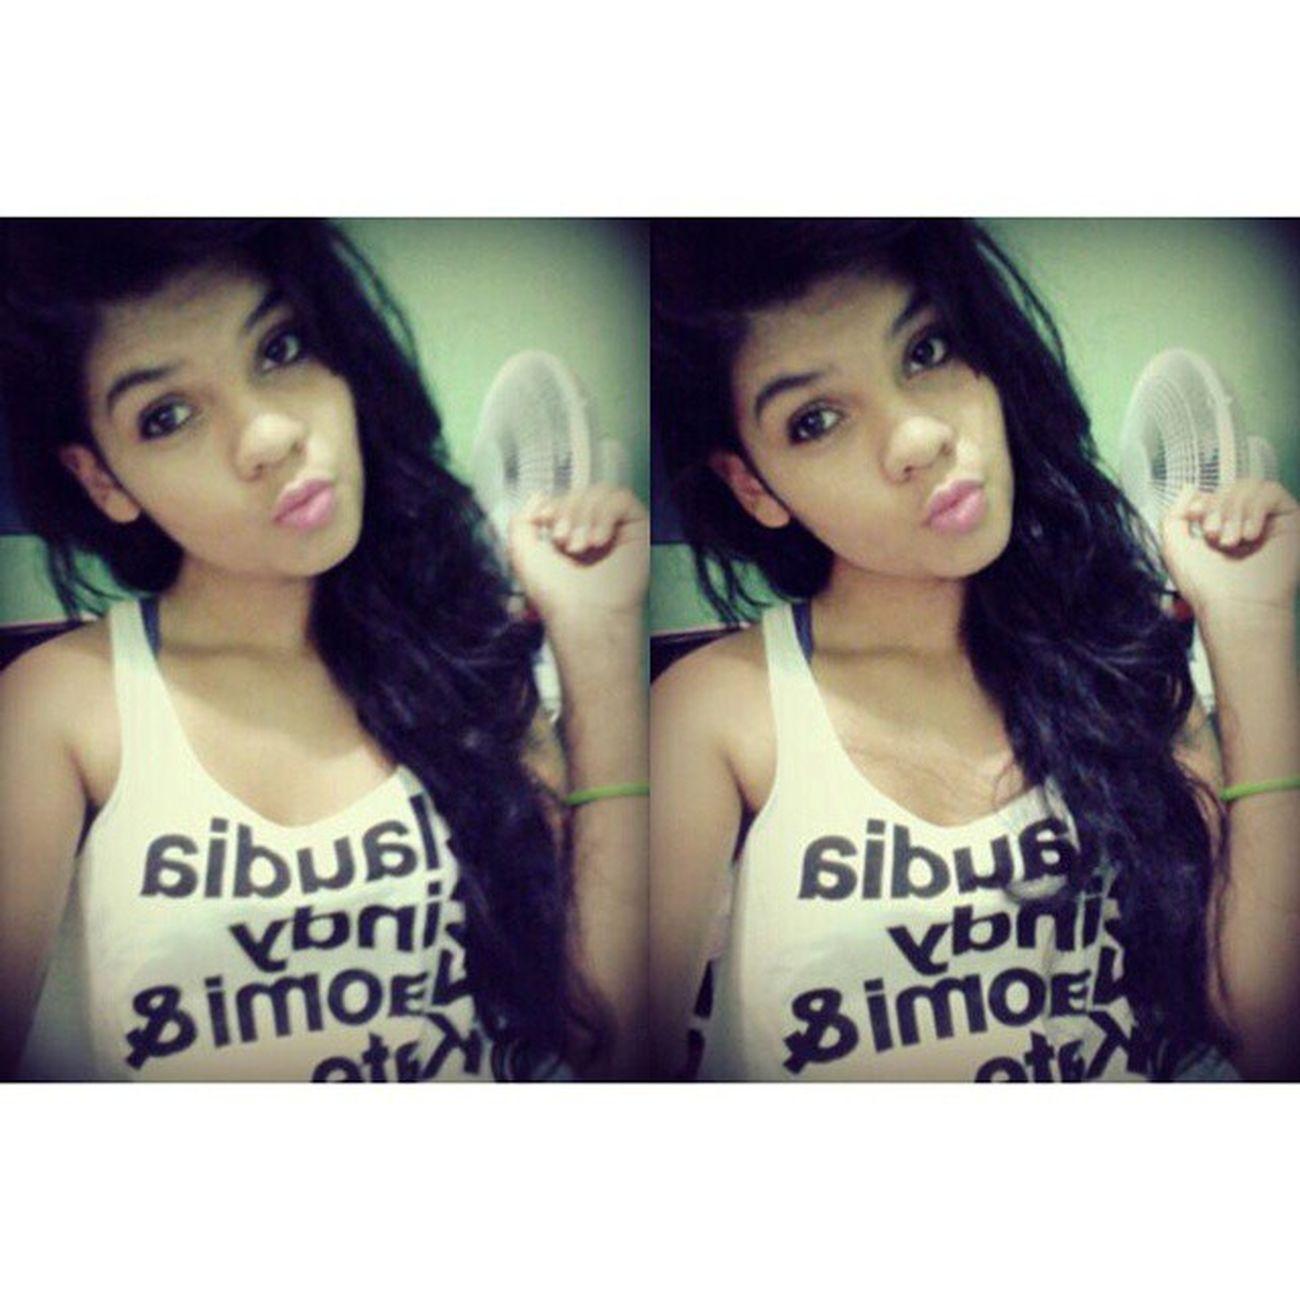 Mina valentona ♬ Emicida Goodnight Instapics Instagram instalike4like like4like lol wow loveit girls photoday Instalike